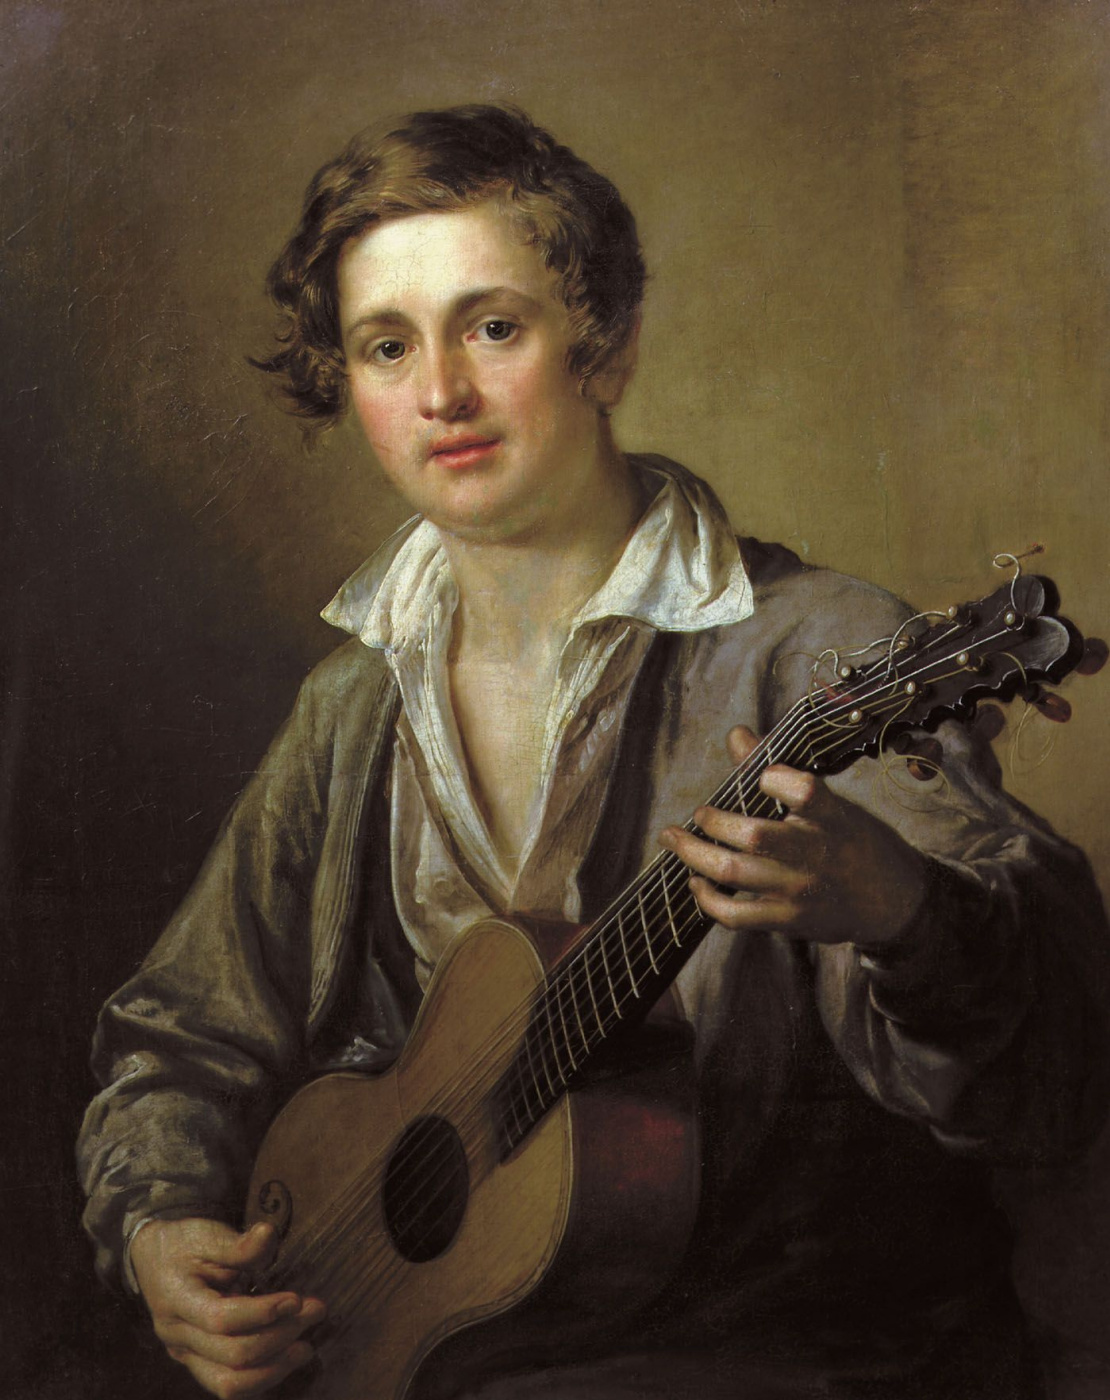 Vasily Tropinin. Guitarist